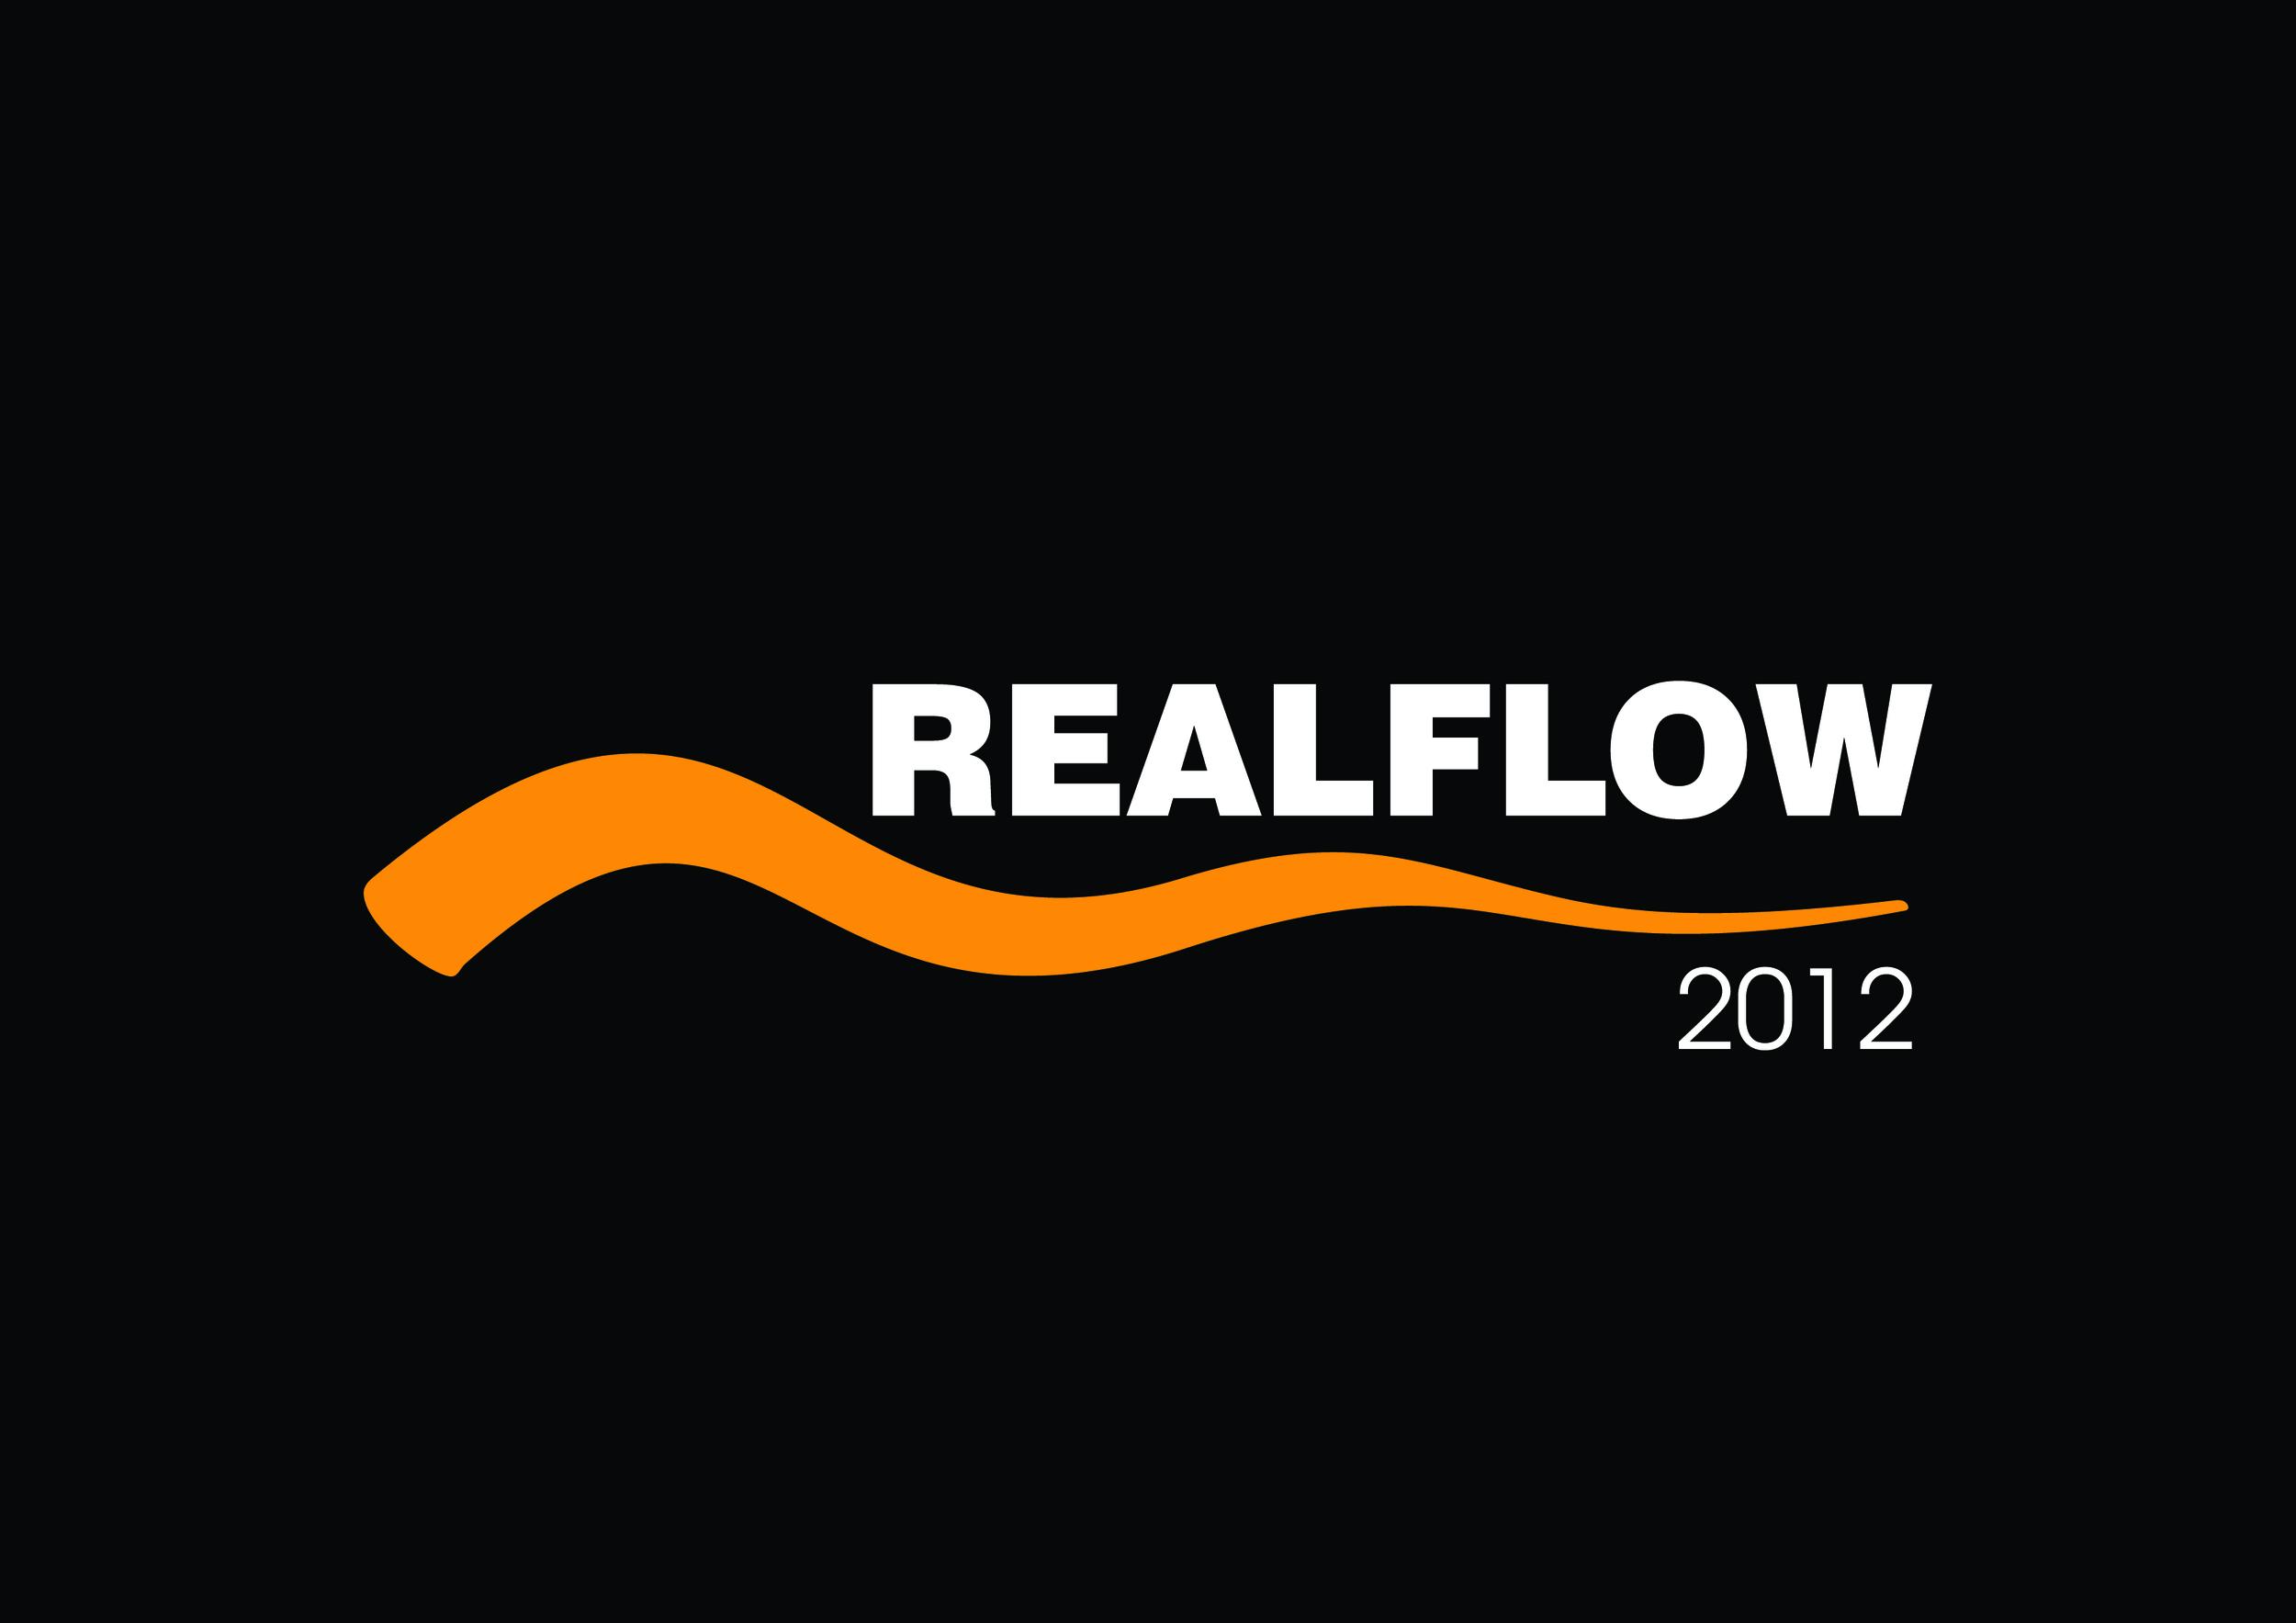 1328105965_realflow_logo_2012_bl_bg.jpg